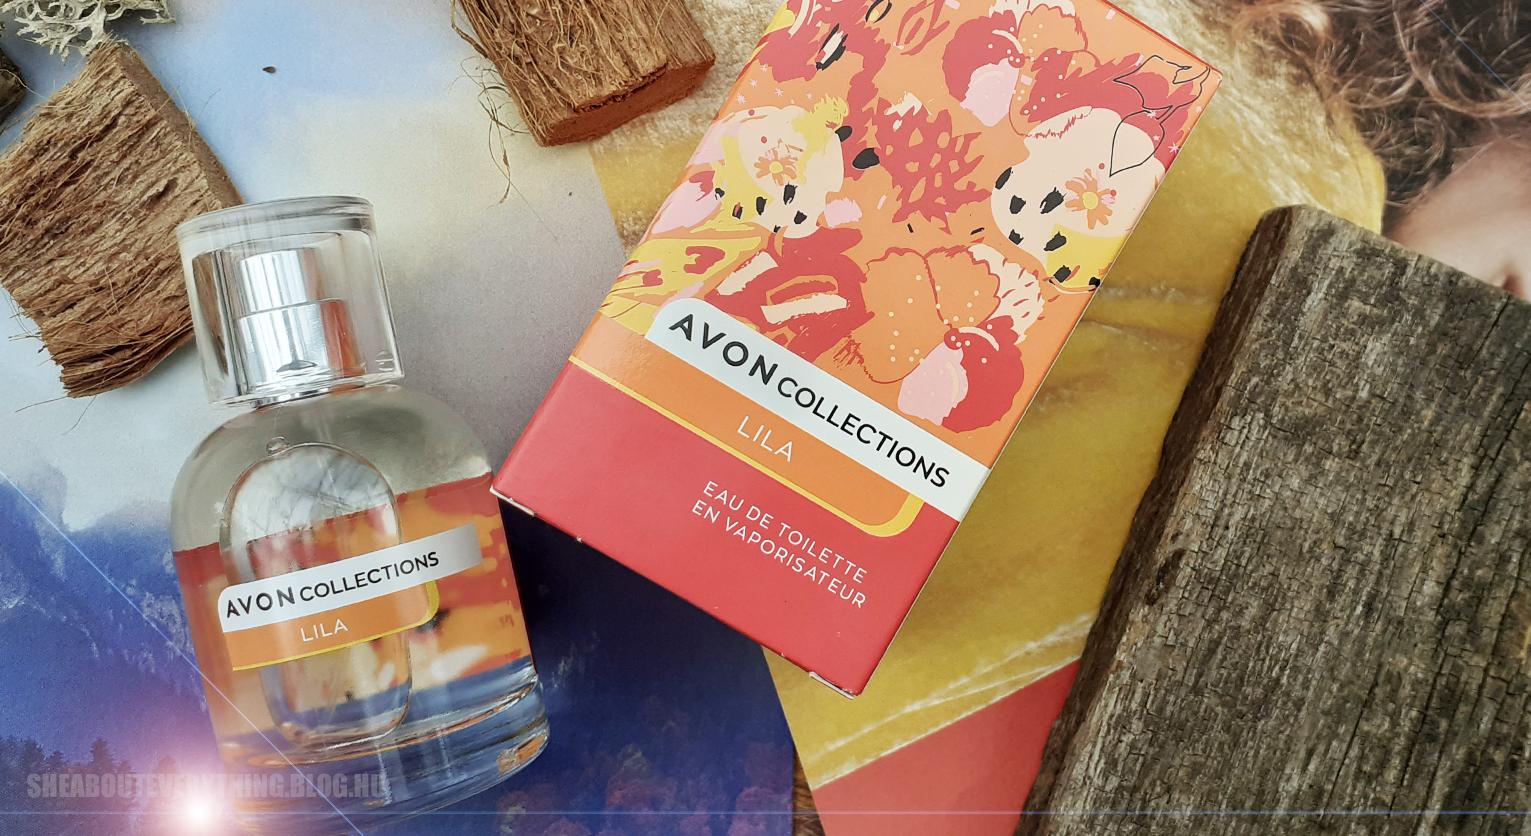 avon-collection-fragrance-2.jpg